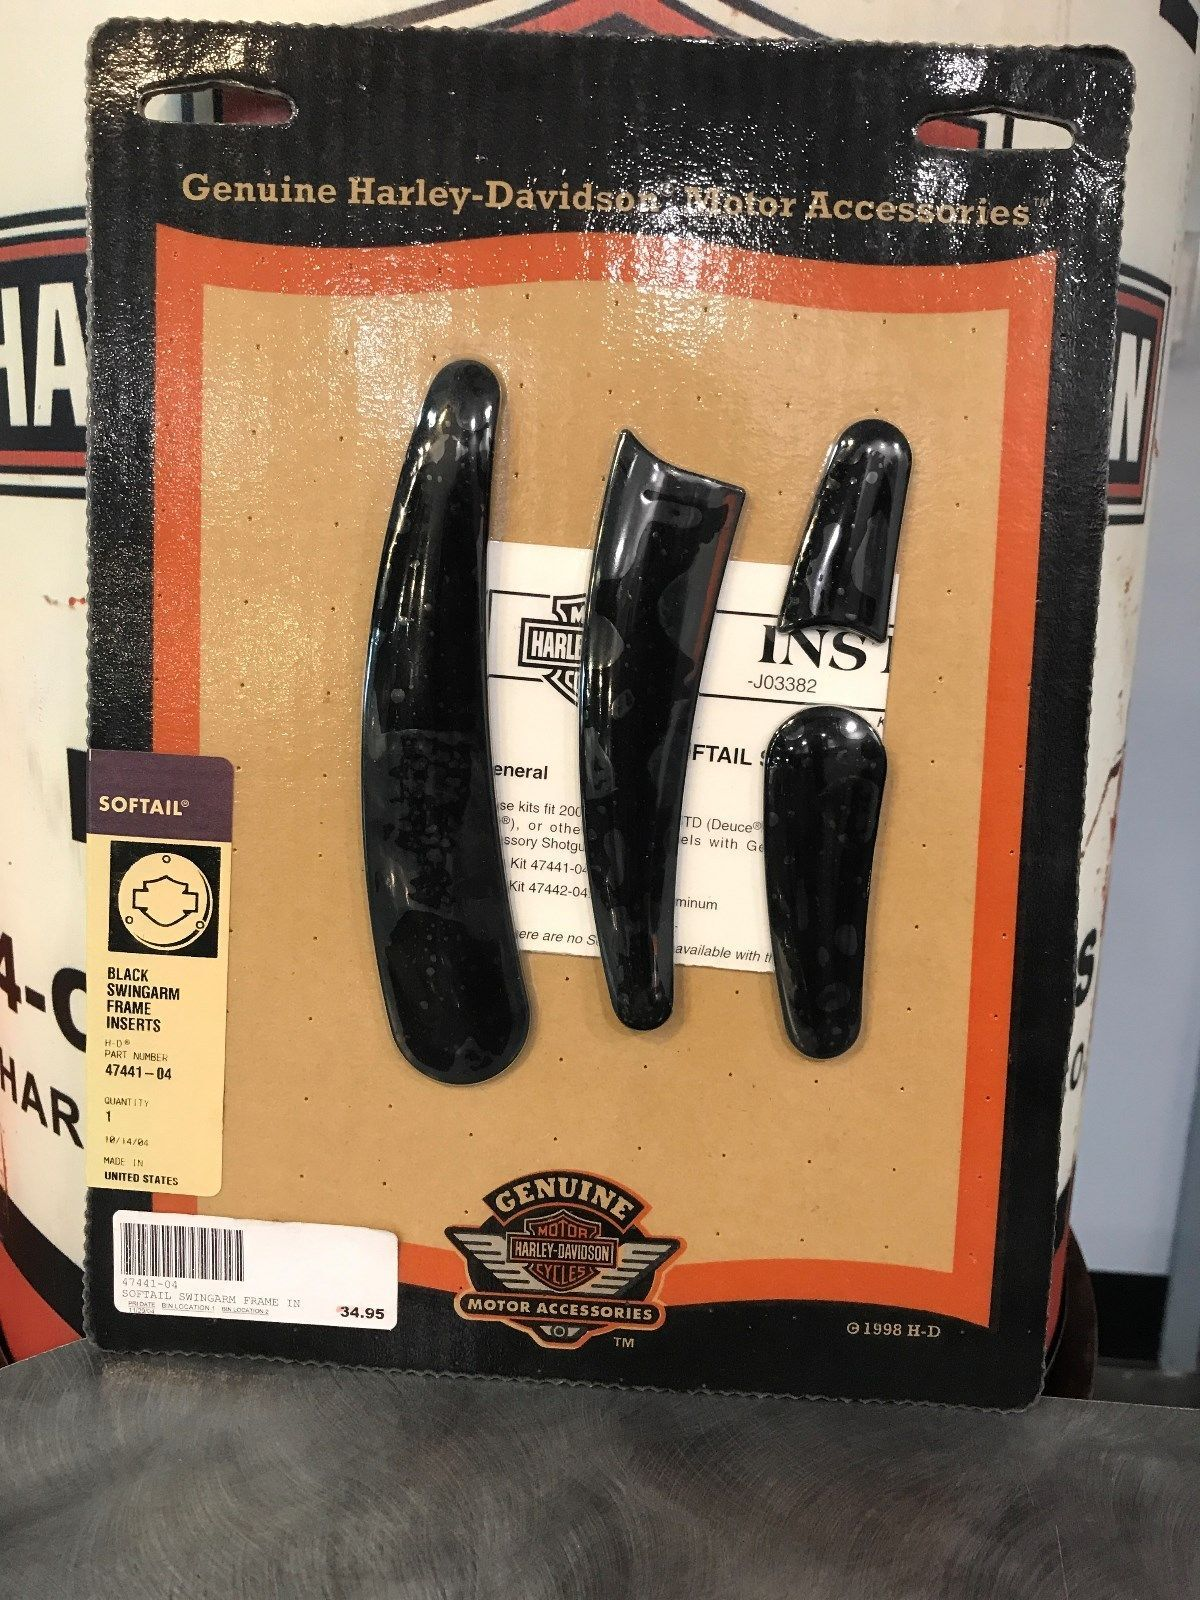 harley Harley Davidson Black Swingarm Frame Inserts Softail 47441-04 ...